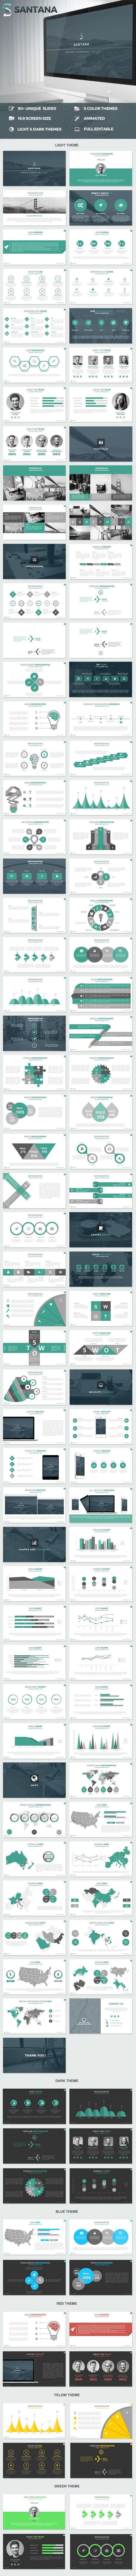 Santana_Powerpoint_Presentation_Template - #PowerPoint #Templates Presentation Templates Download here: https://graphicriver.net/item/santana_powerpoint_presentation_template/15194061?ref=alena994